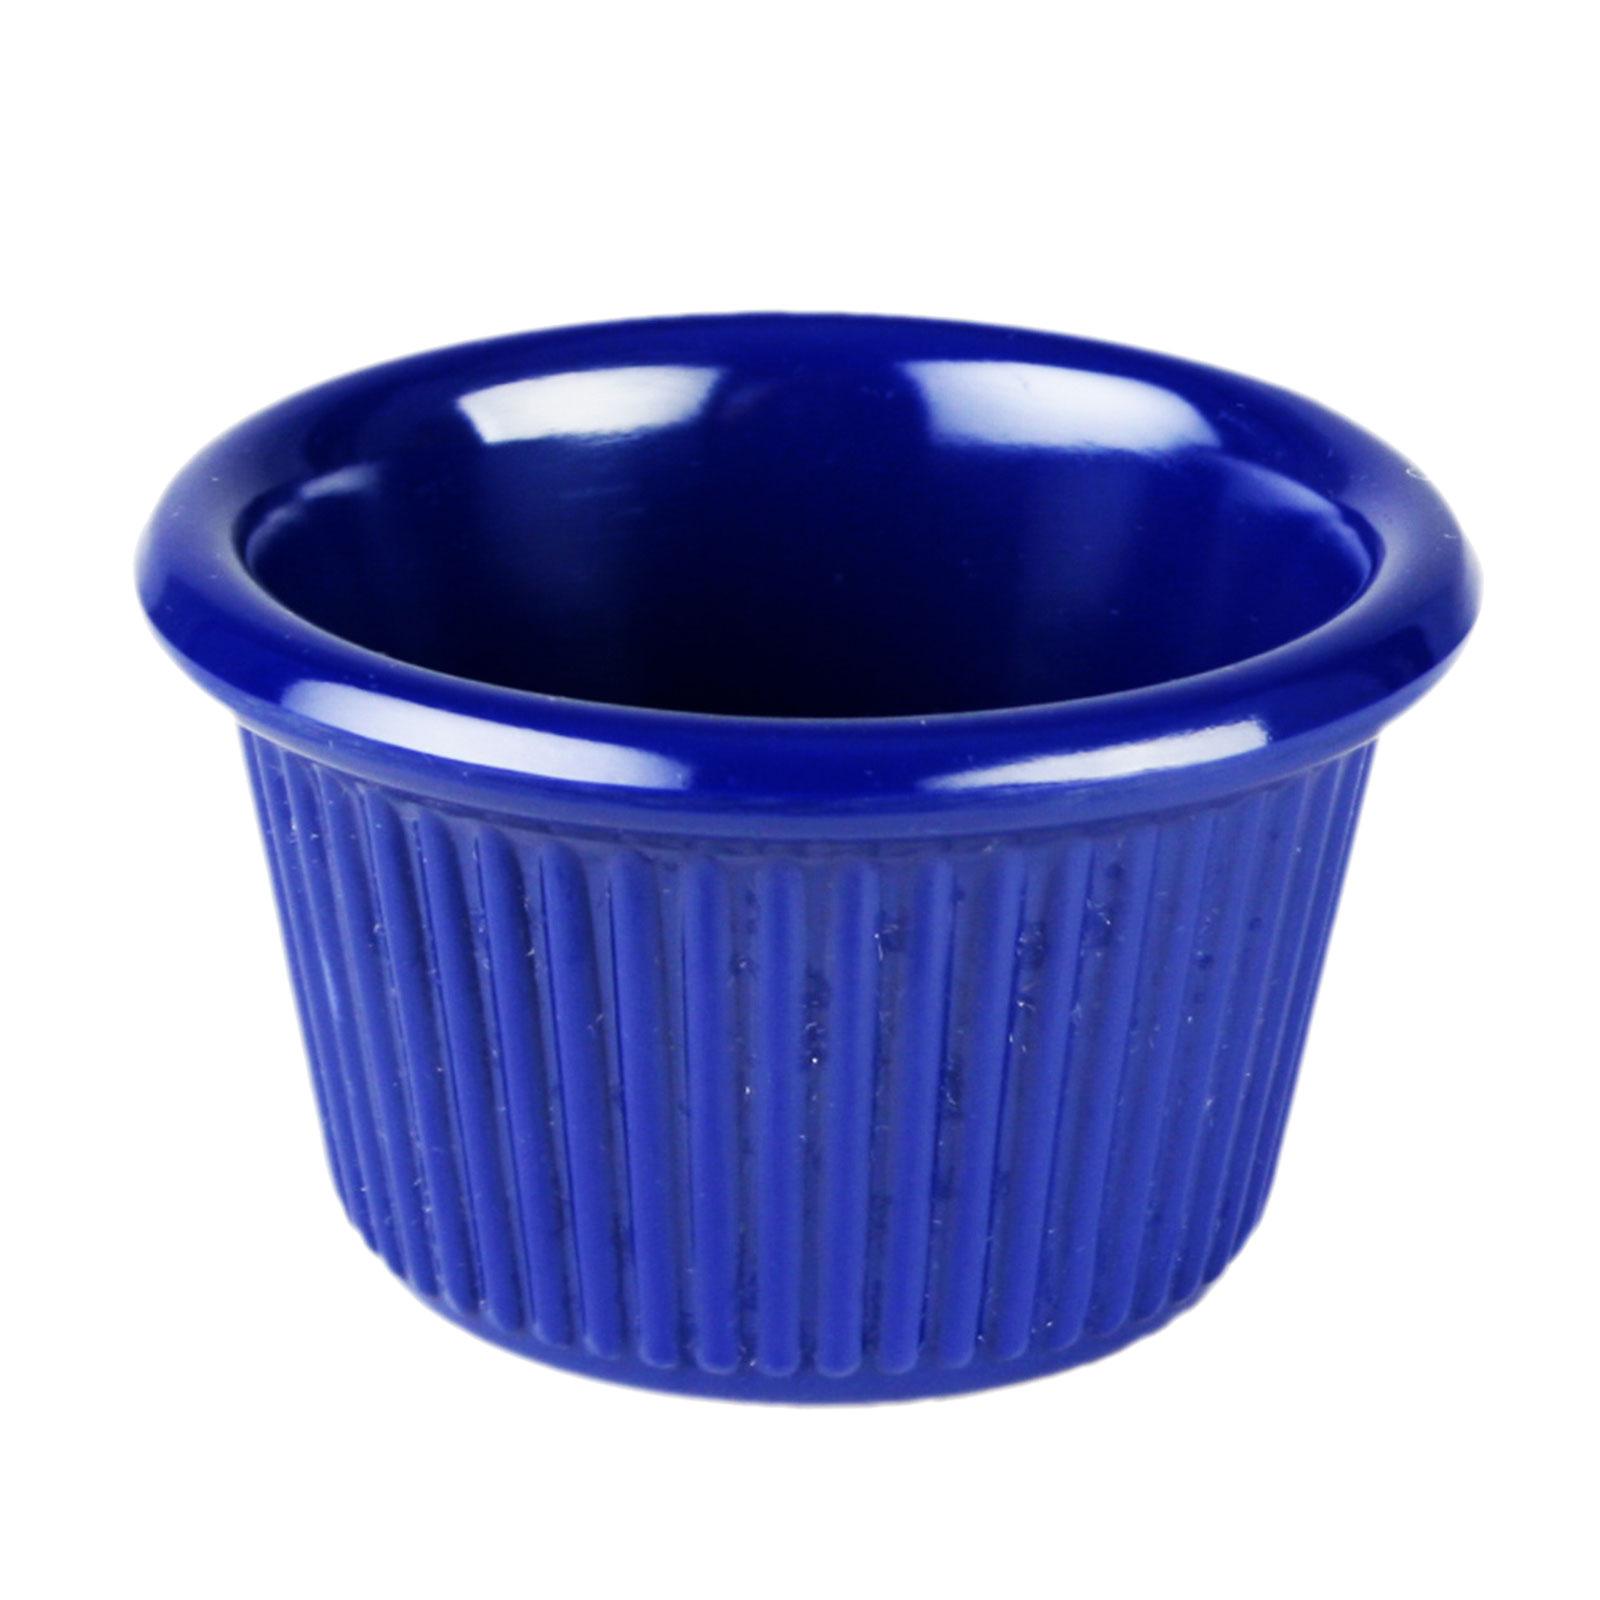 Thunder Group ML507CB1 ramekin / sauce cup, plastic